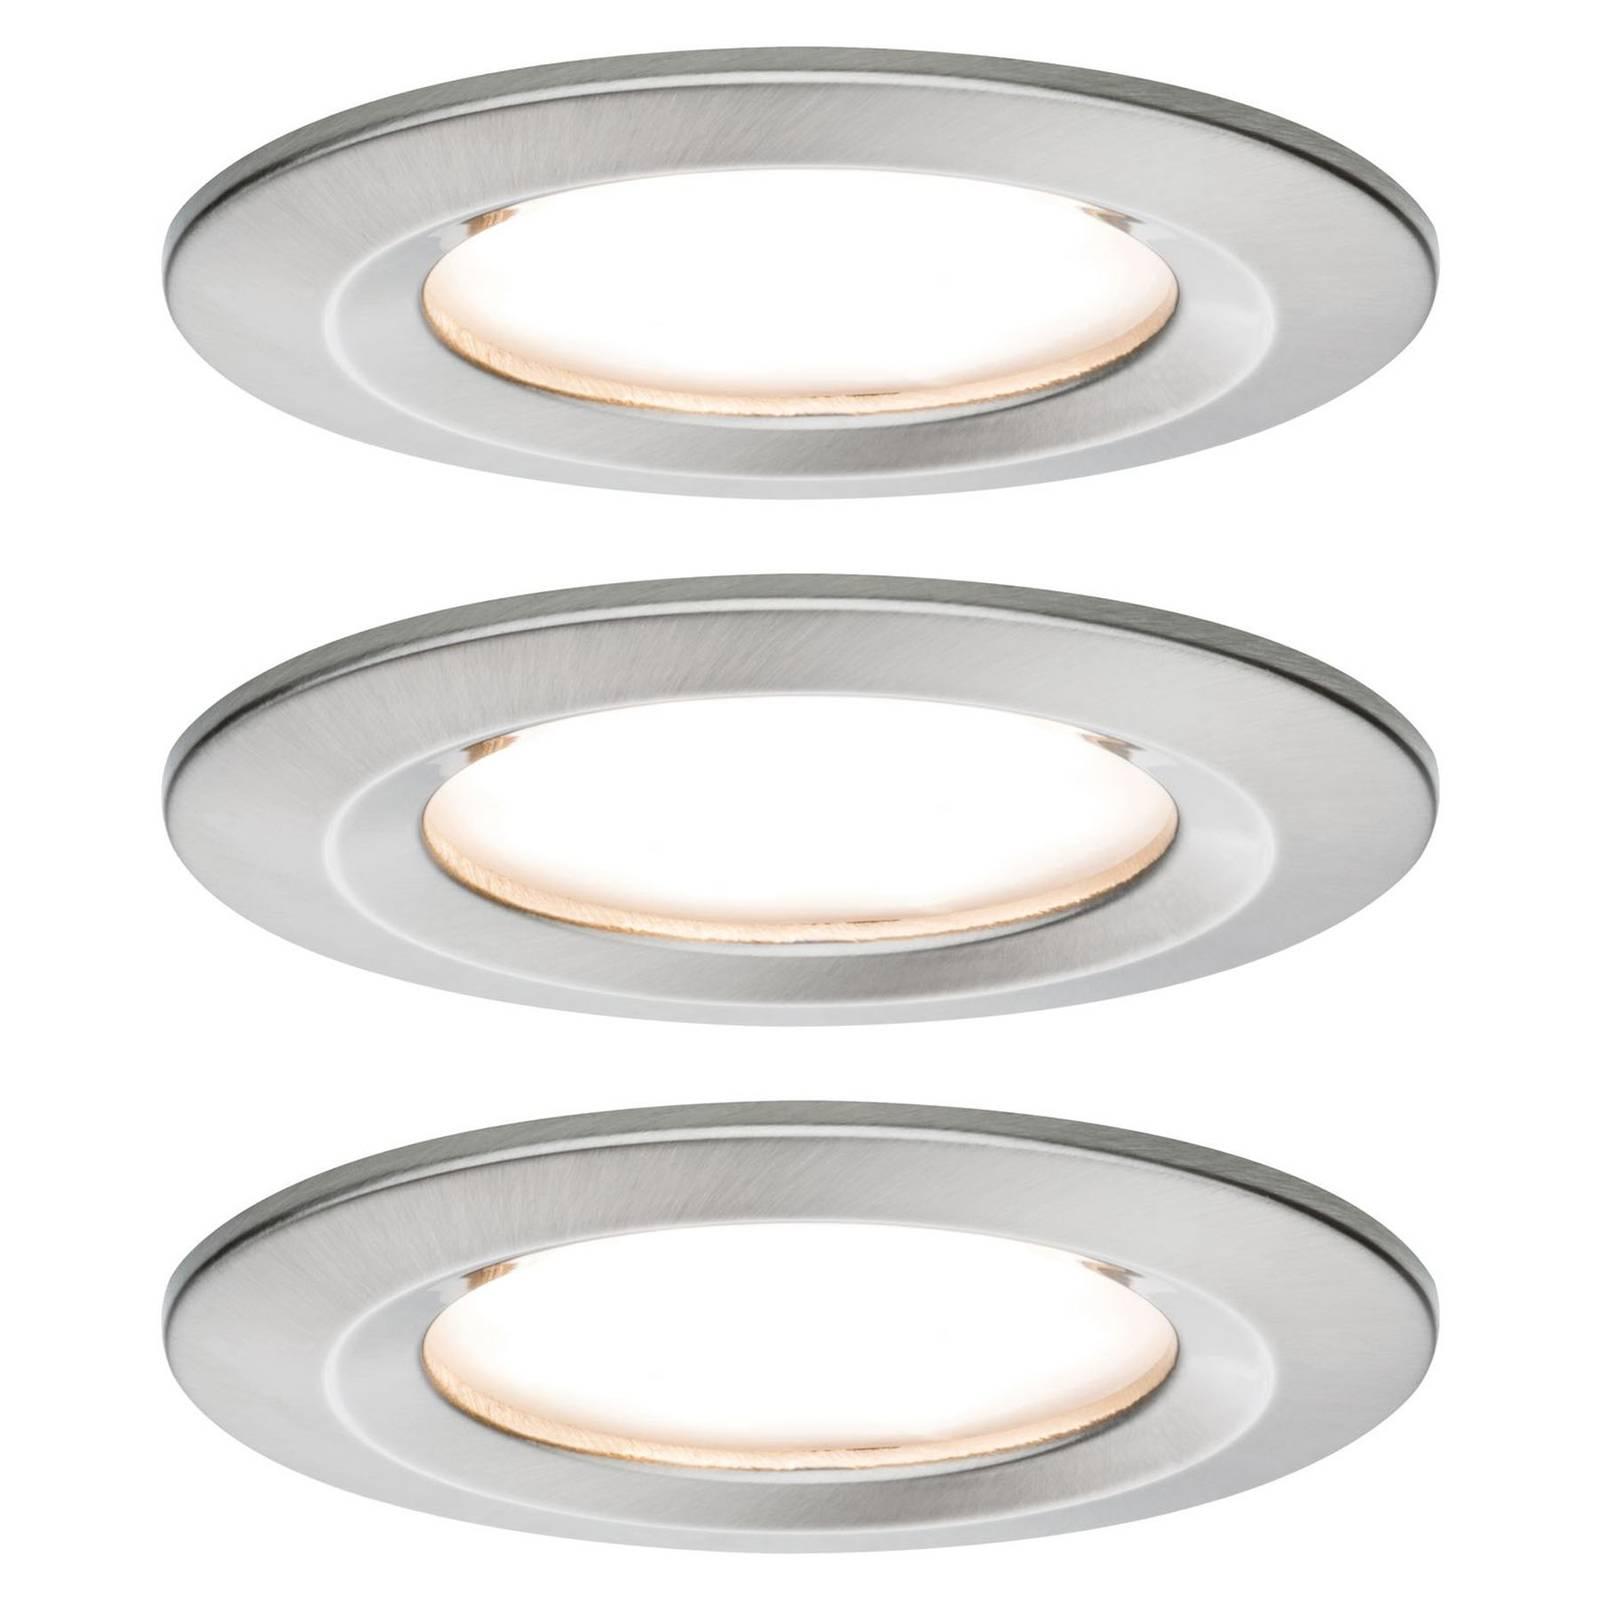 Paulmann Nova -LED-uppovalaisin 3 kpl, rauta